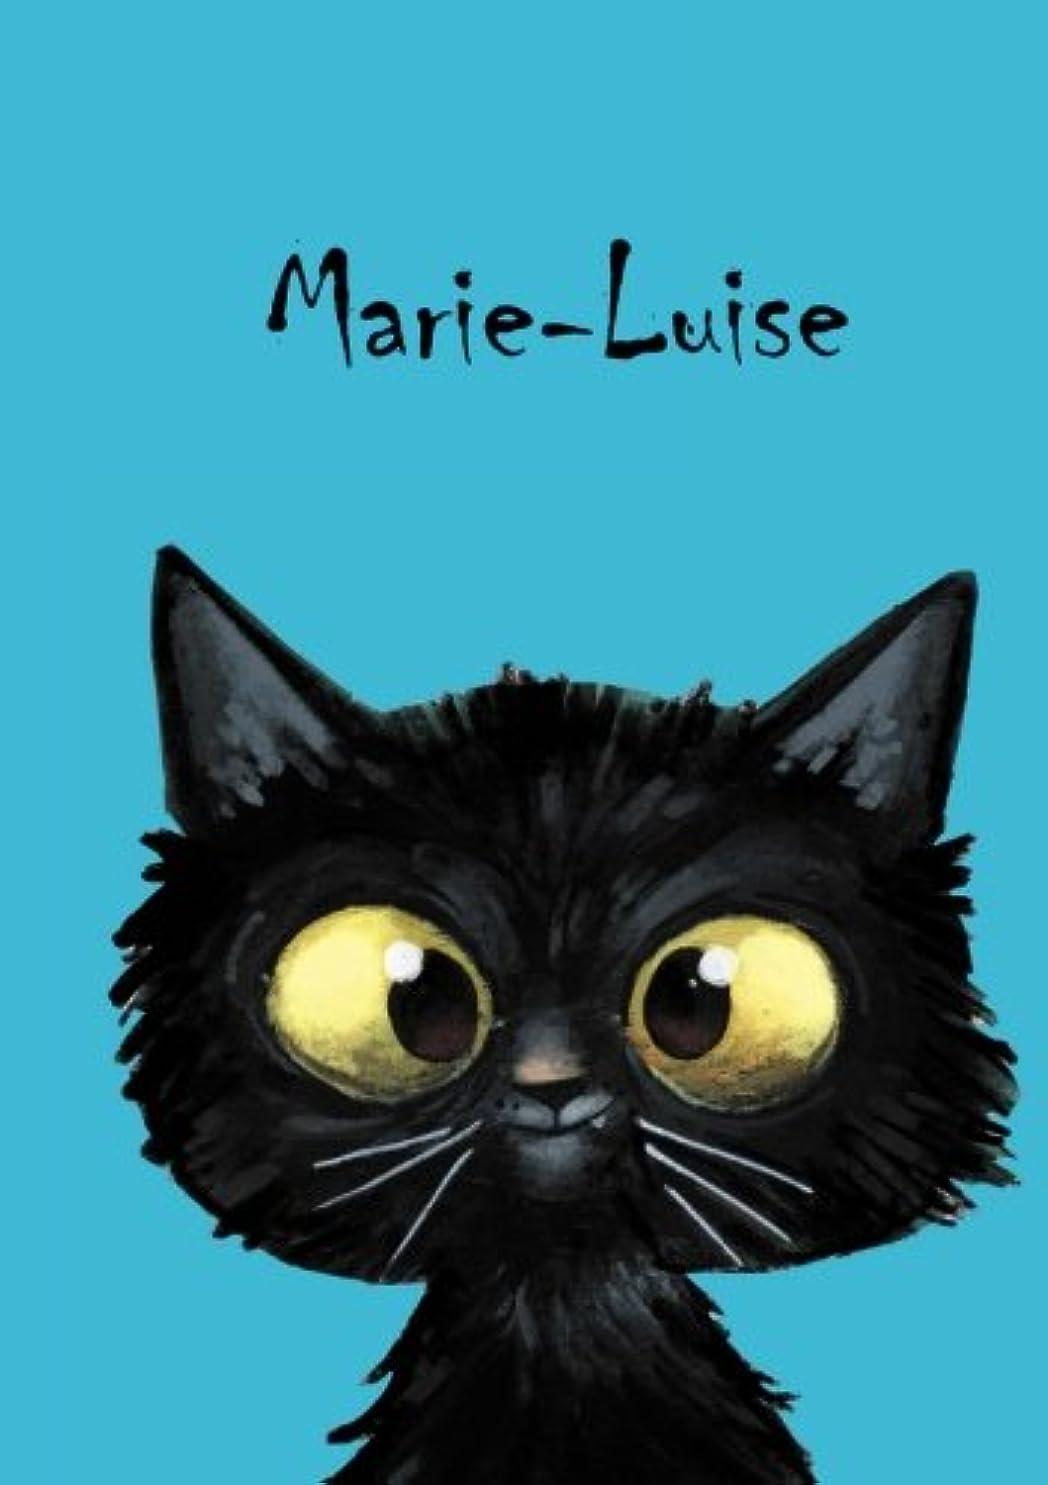 アシストウェブウールMarie-Luise: Personalisiertes Notizbuch, DIN A5, 80 blanko Seiten mit kleiner Katze auf jeder rechten unteren Seite. Durch Vornamen auf dem Cover, eine schoene kleine Aufmerksamkeit fuer Katzenfreunde. Mattes, handschmeichelndes Coverfinish. Ueber 2500 Namen bereits verf